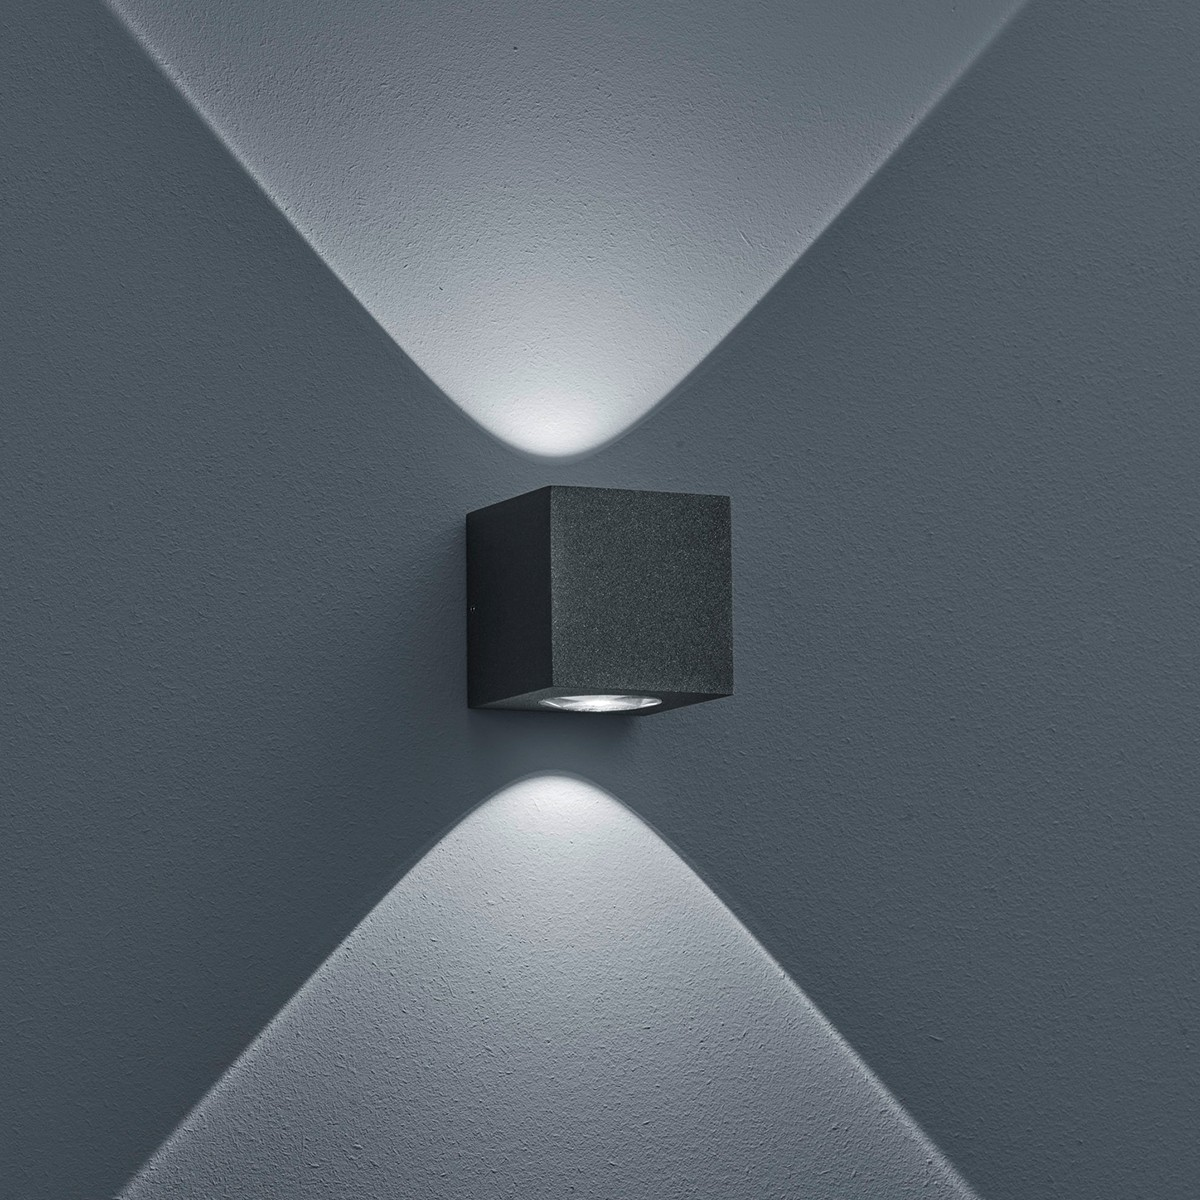 Helestra Peka LED Außenwandleuchte, graphit